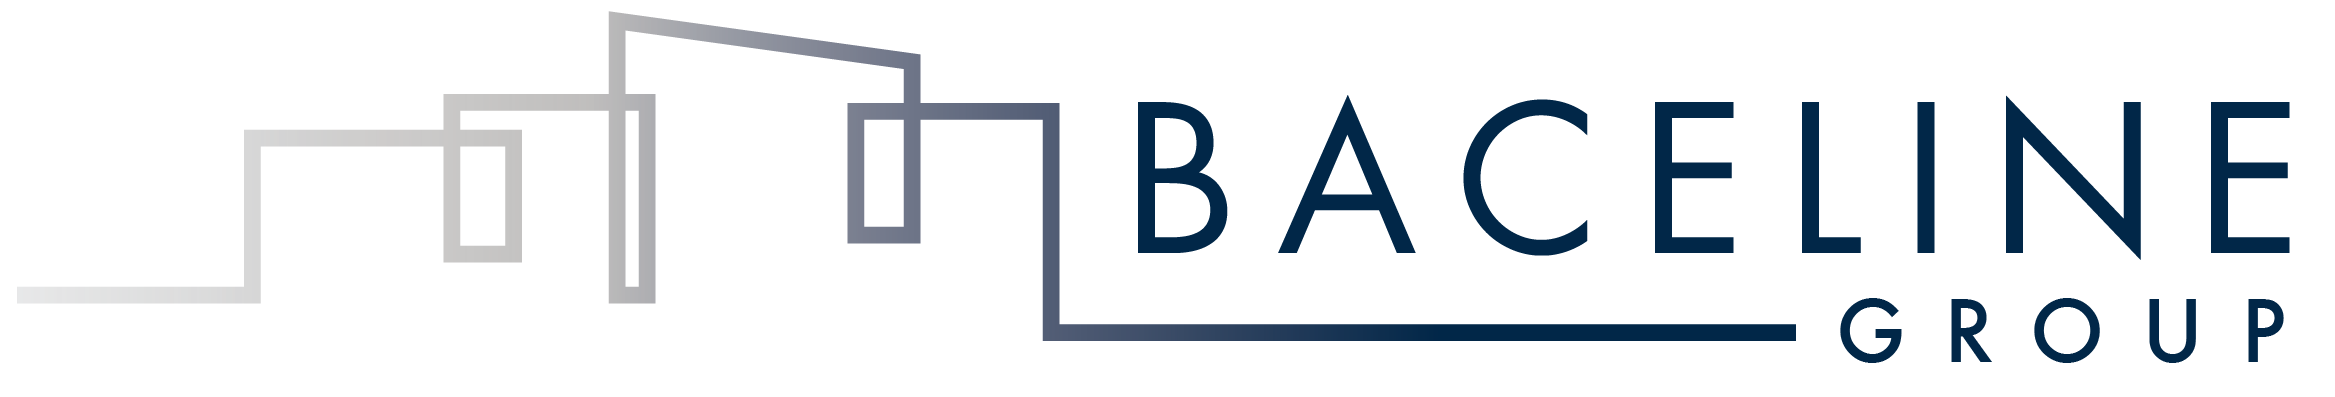 Baceline Group